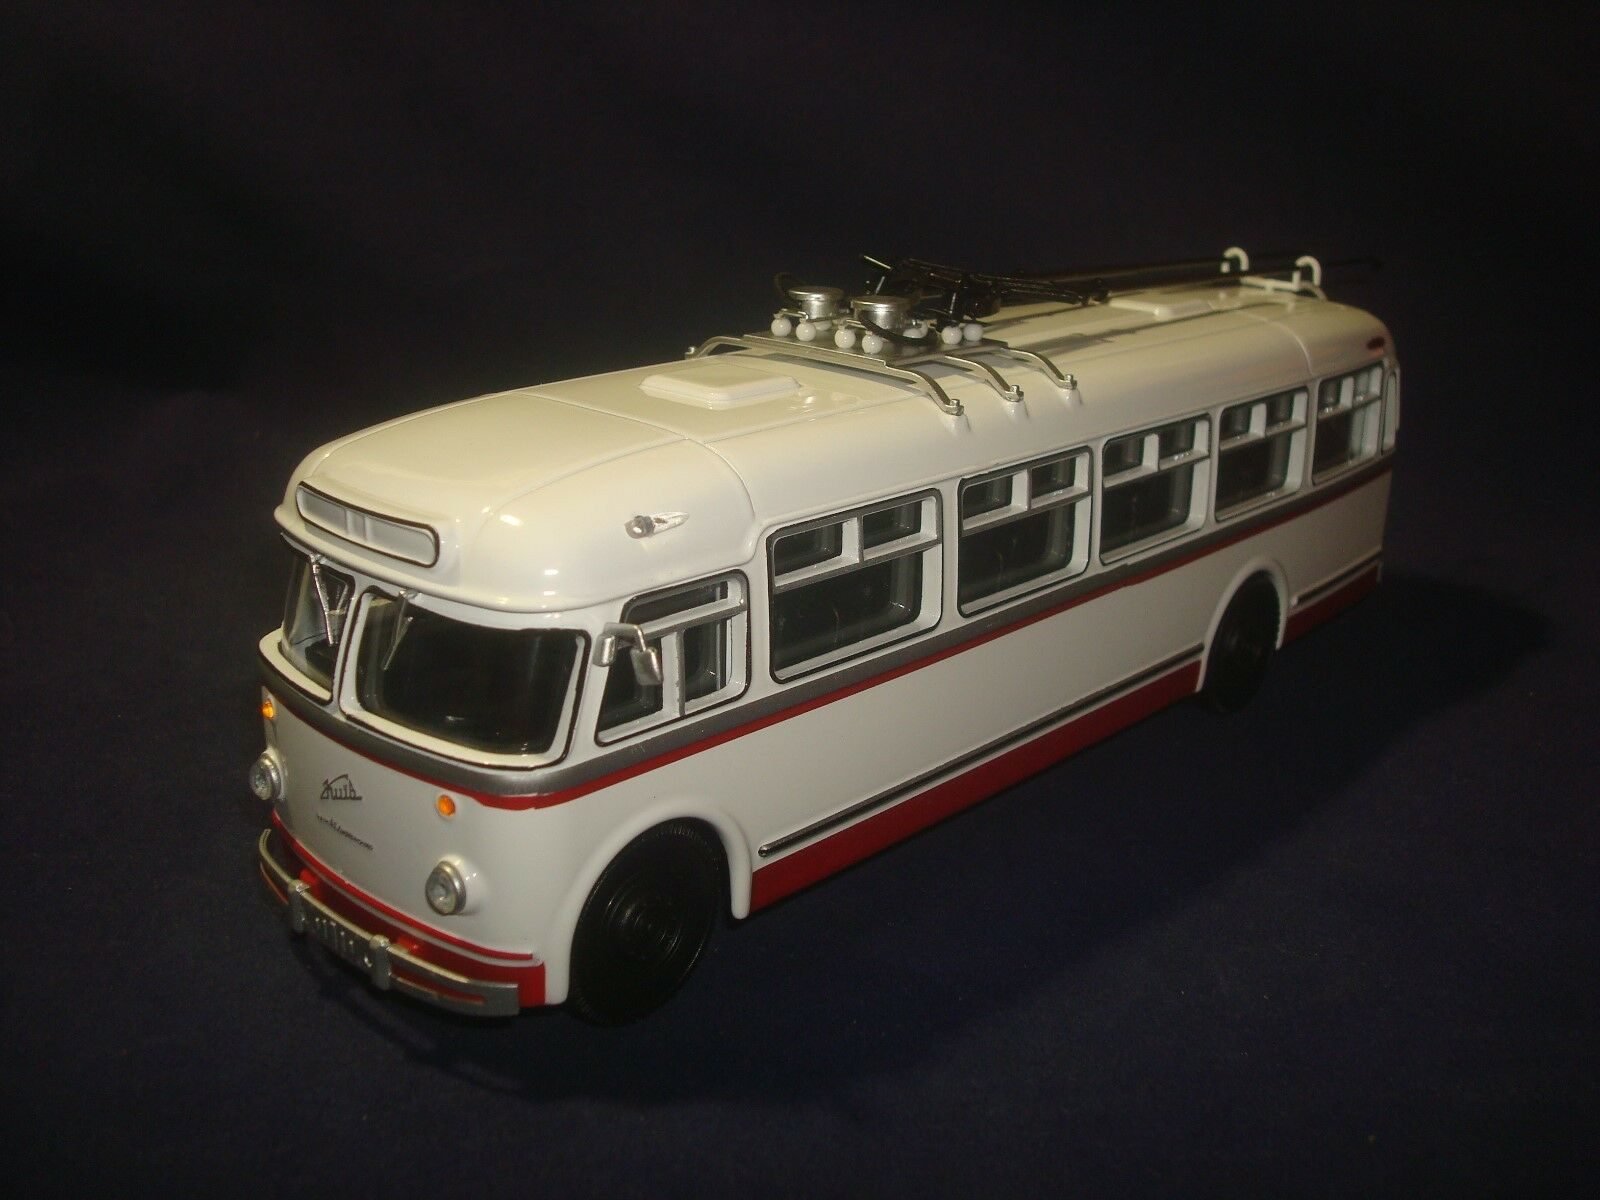 Trolleybus KTB-4 KIEV (1963-1969) Soviet Bus 1 43